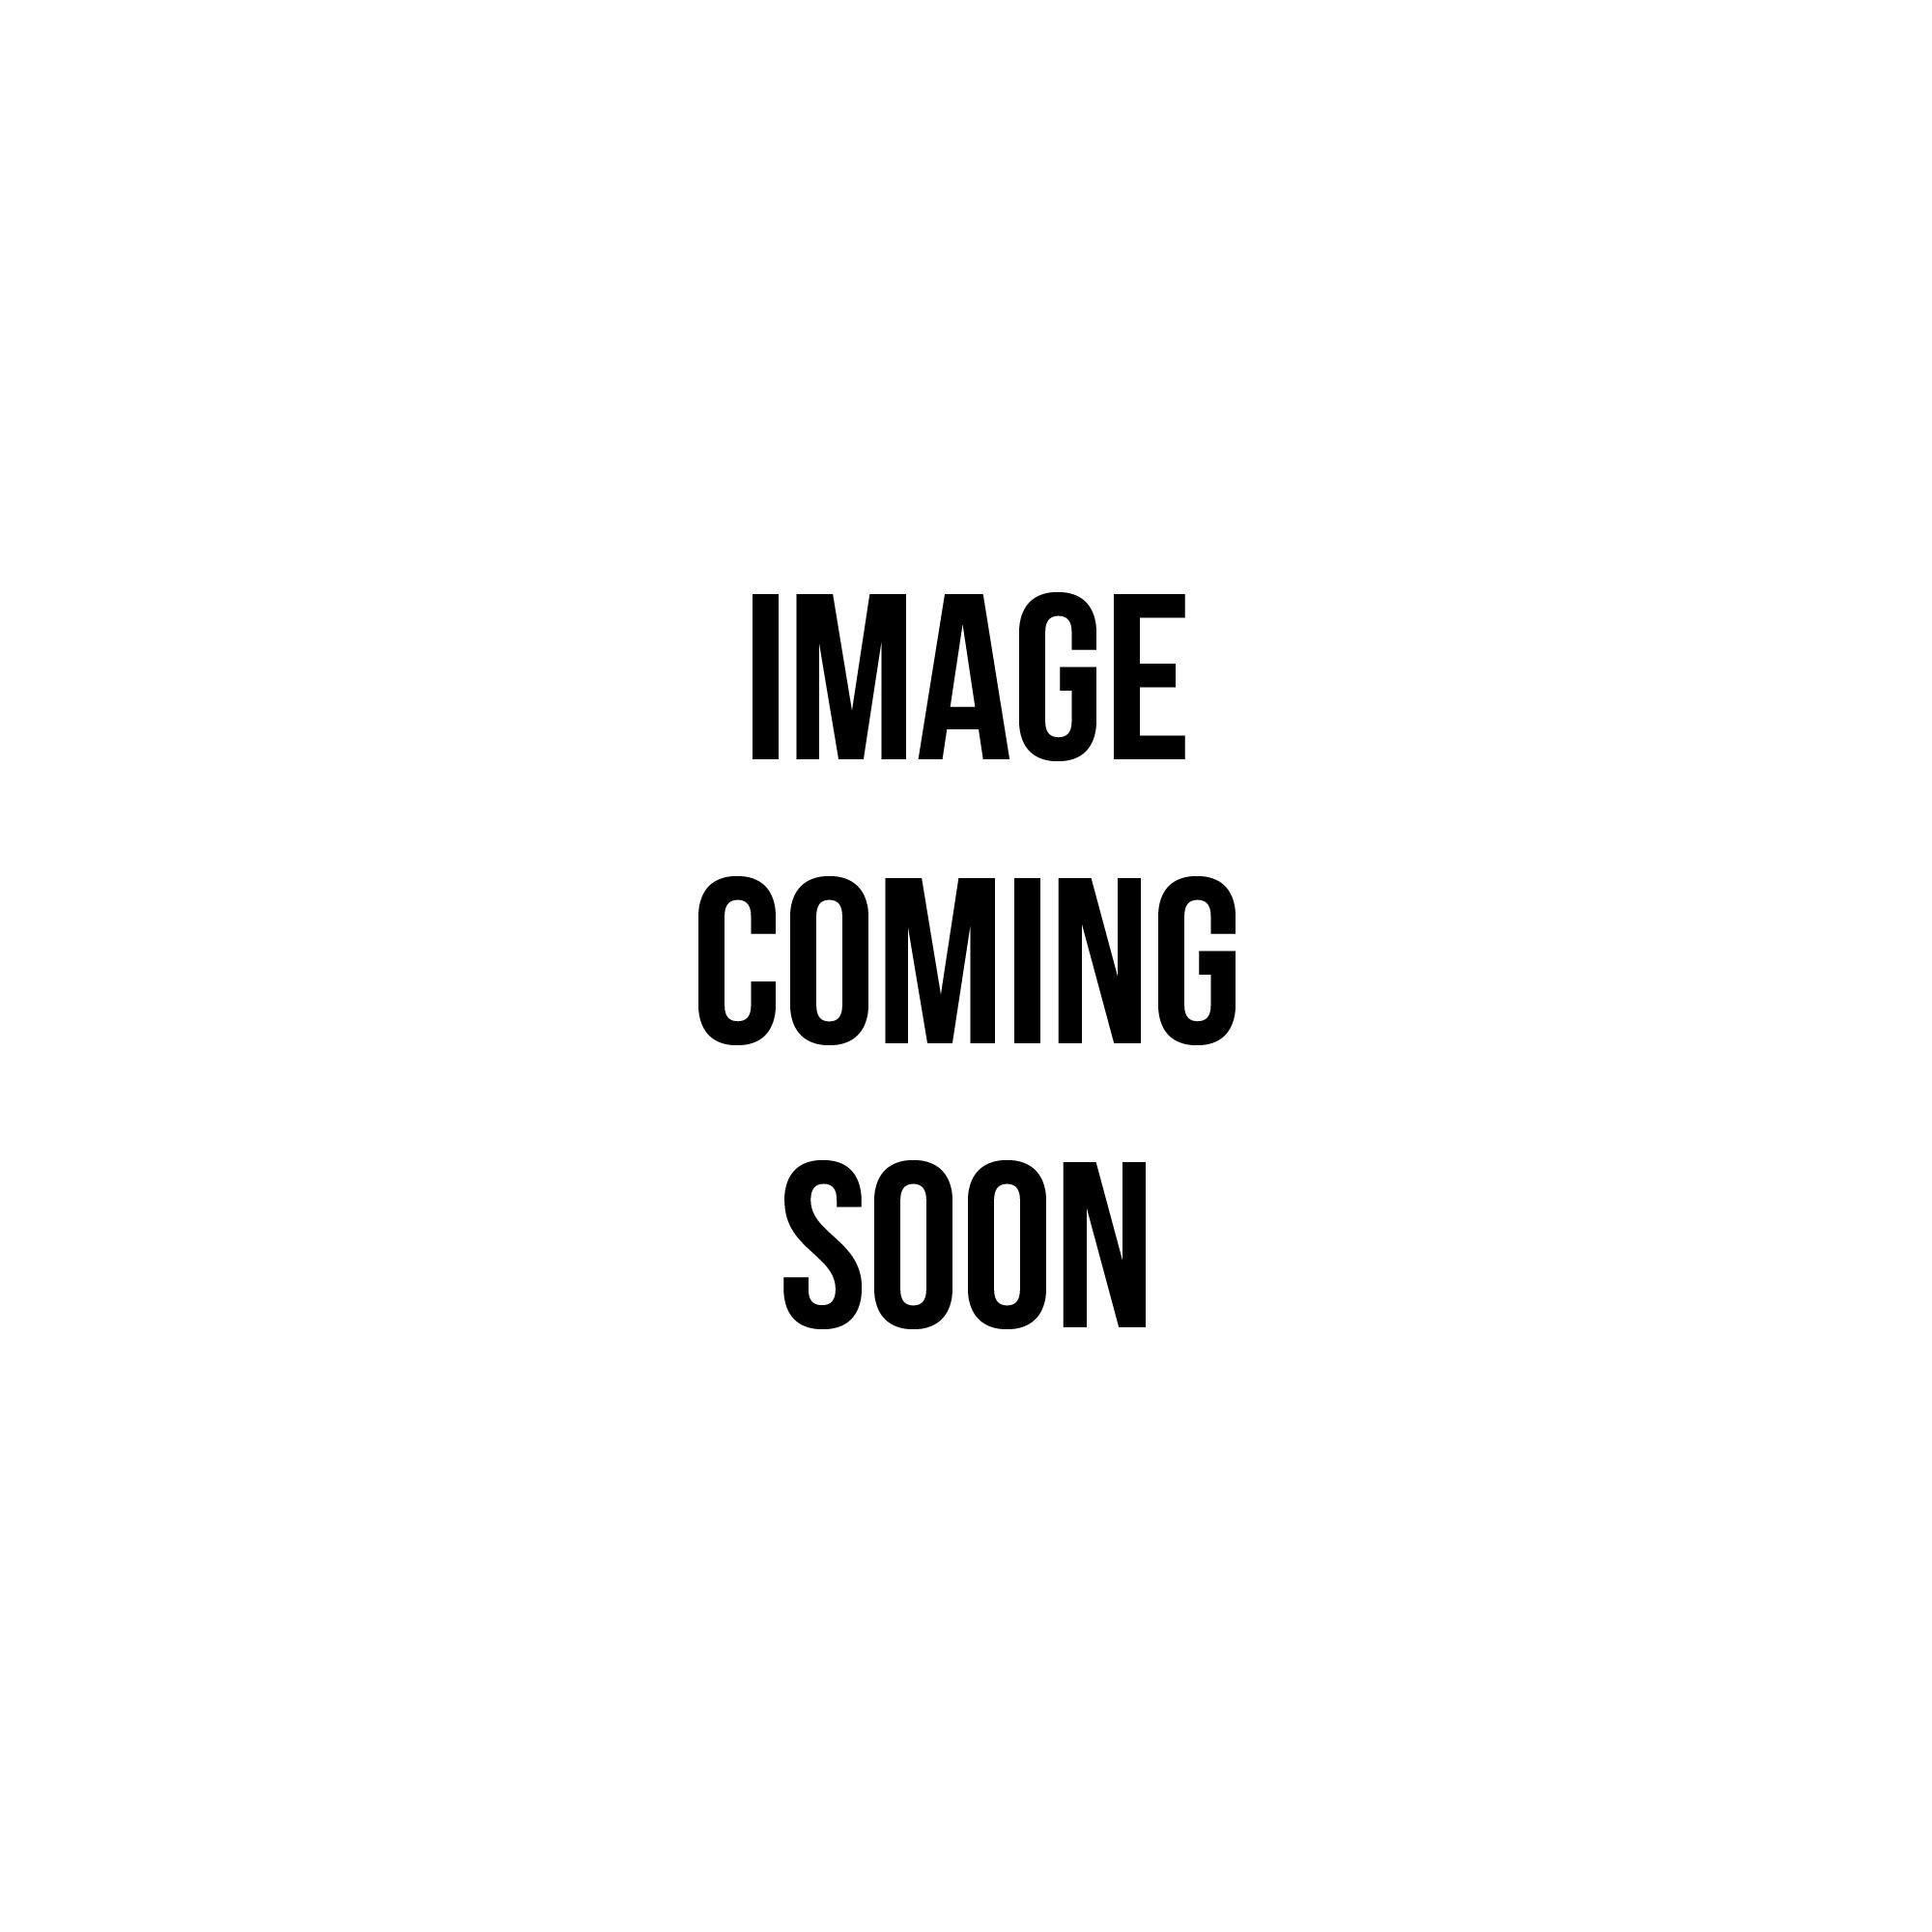 adidas Originals Eqt Support 93/17 Boost - Men\u0027s - Black / White